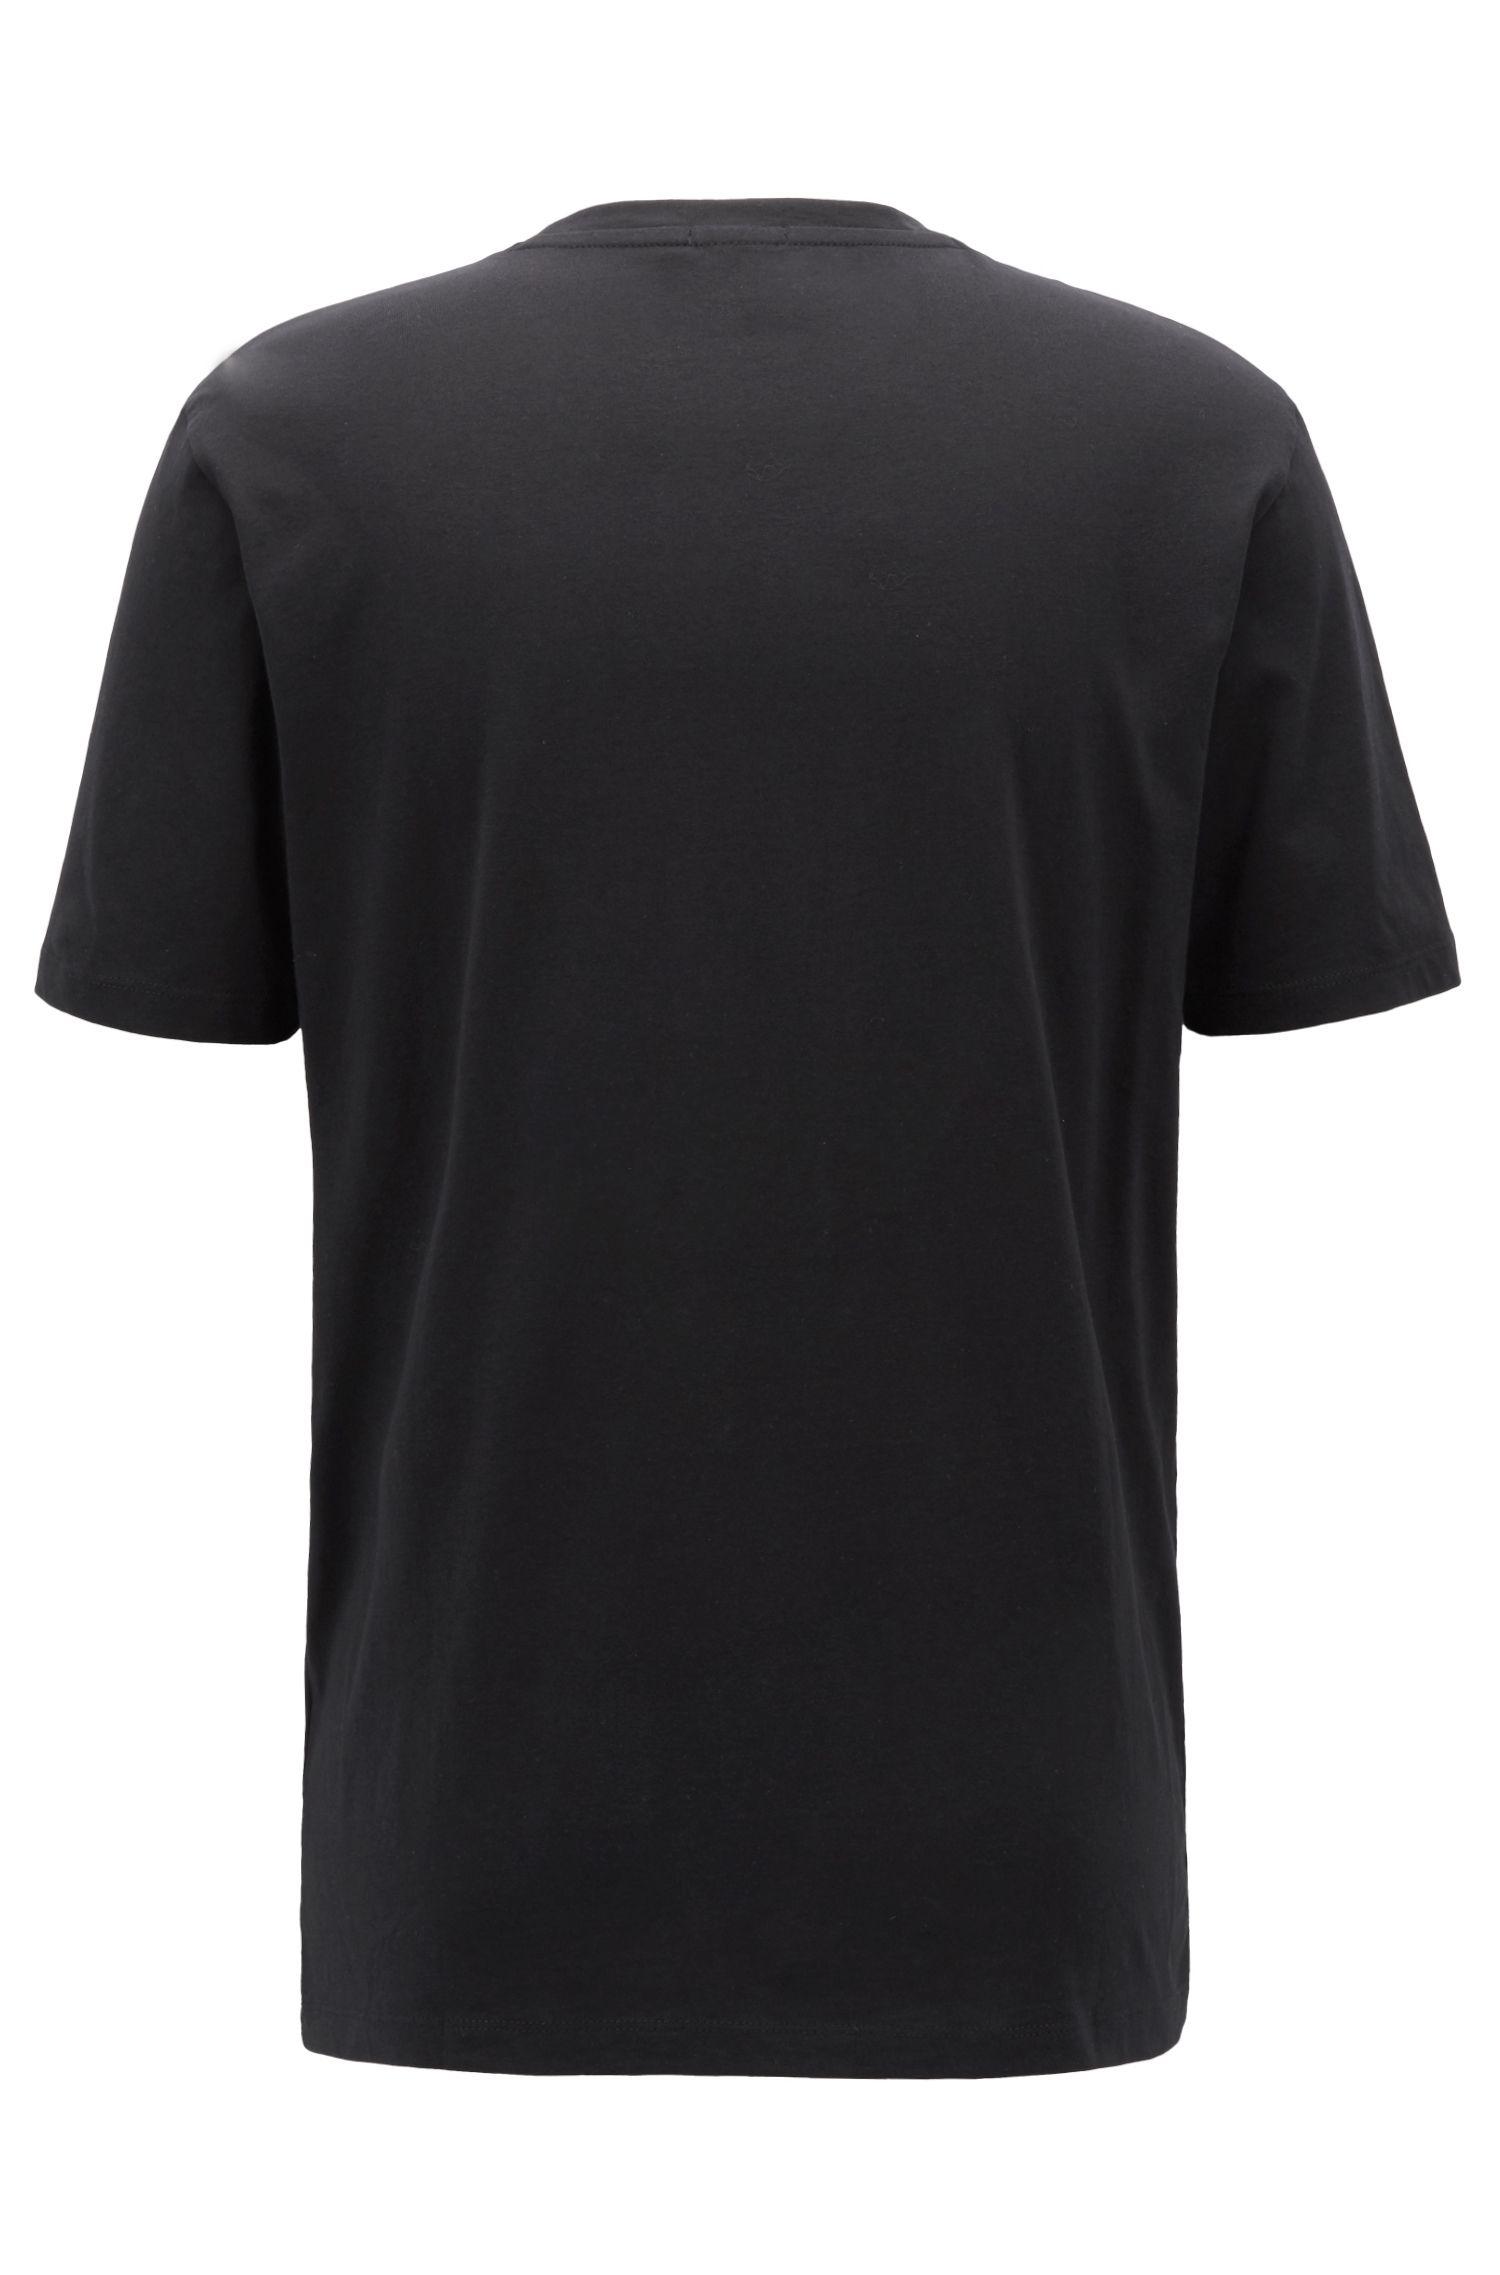 Cotton T-shirt with monogram logo, Black